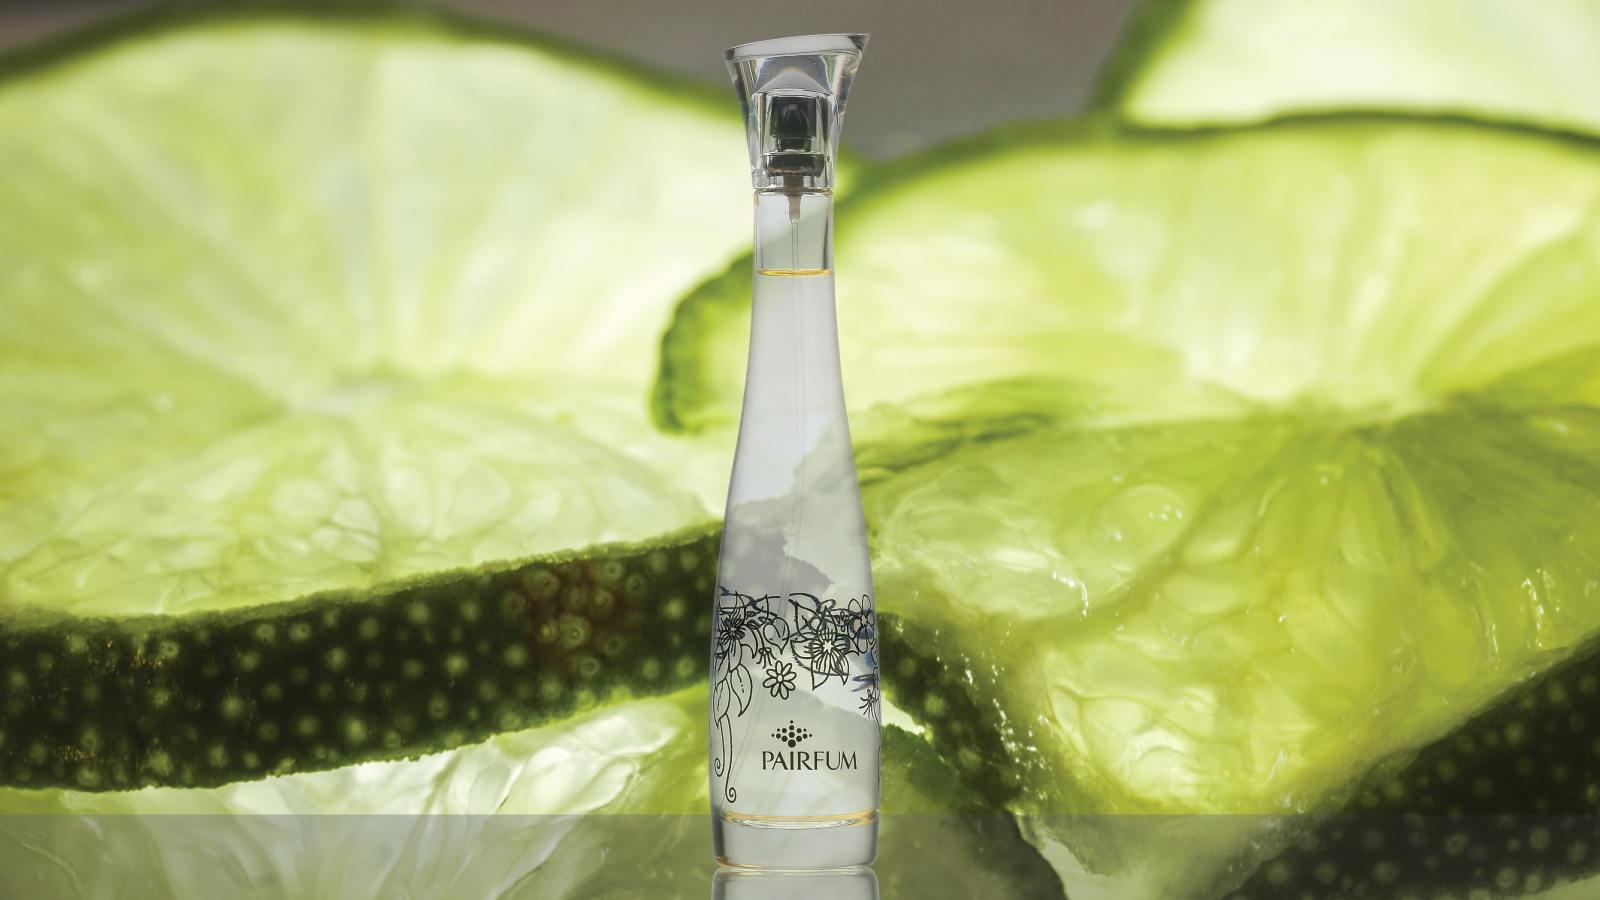 Flacon Room Fragrance Spray Citrus Green 16 9